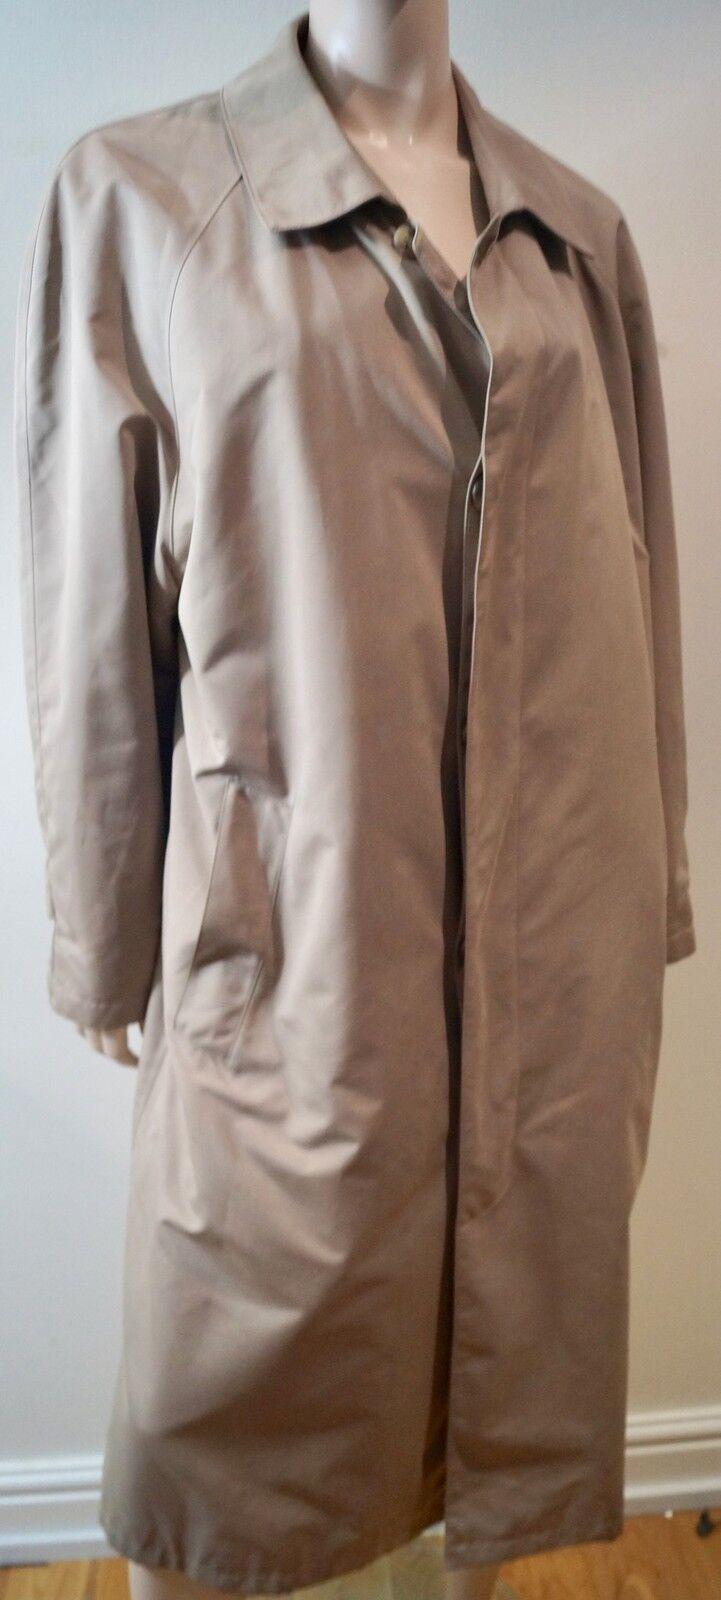 BROOKS BredHERS Menswear Beige Collared Detachable Lining Trench Mac Coat M